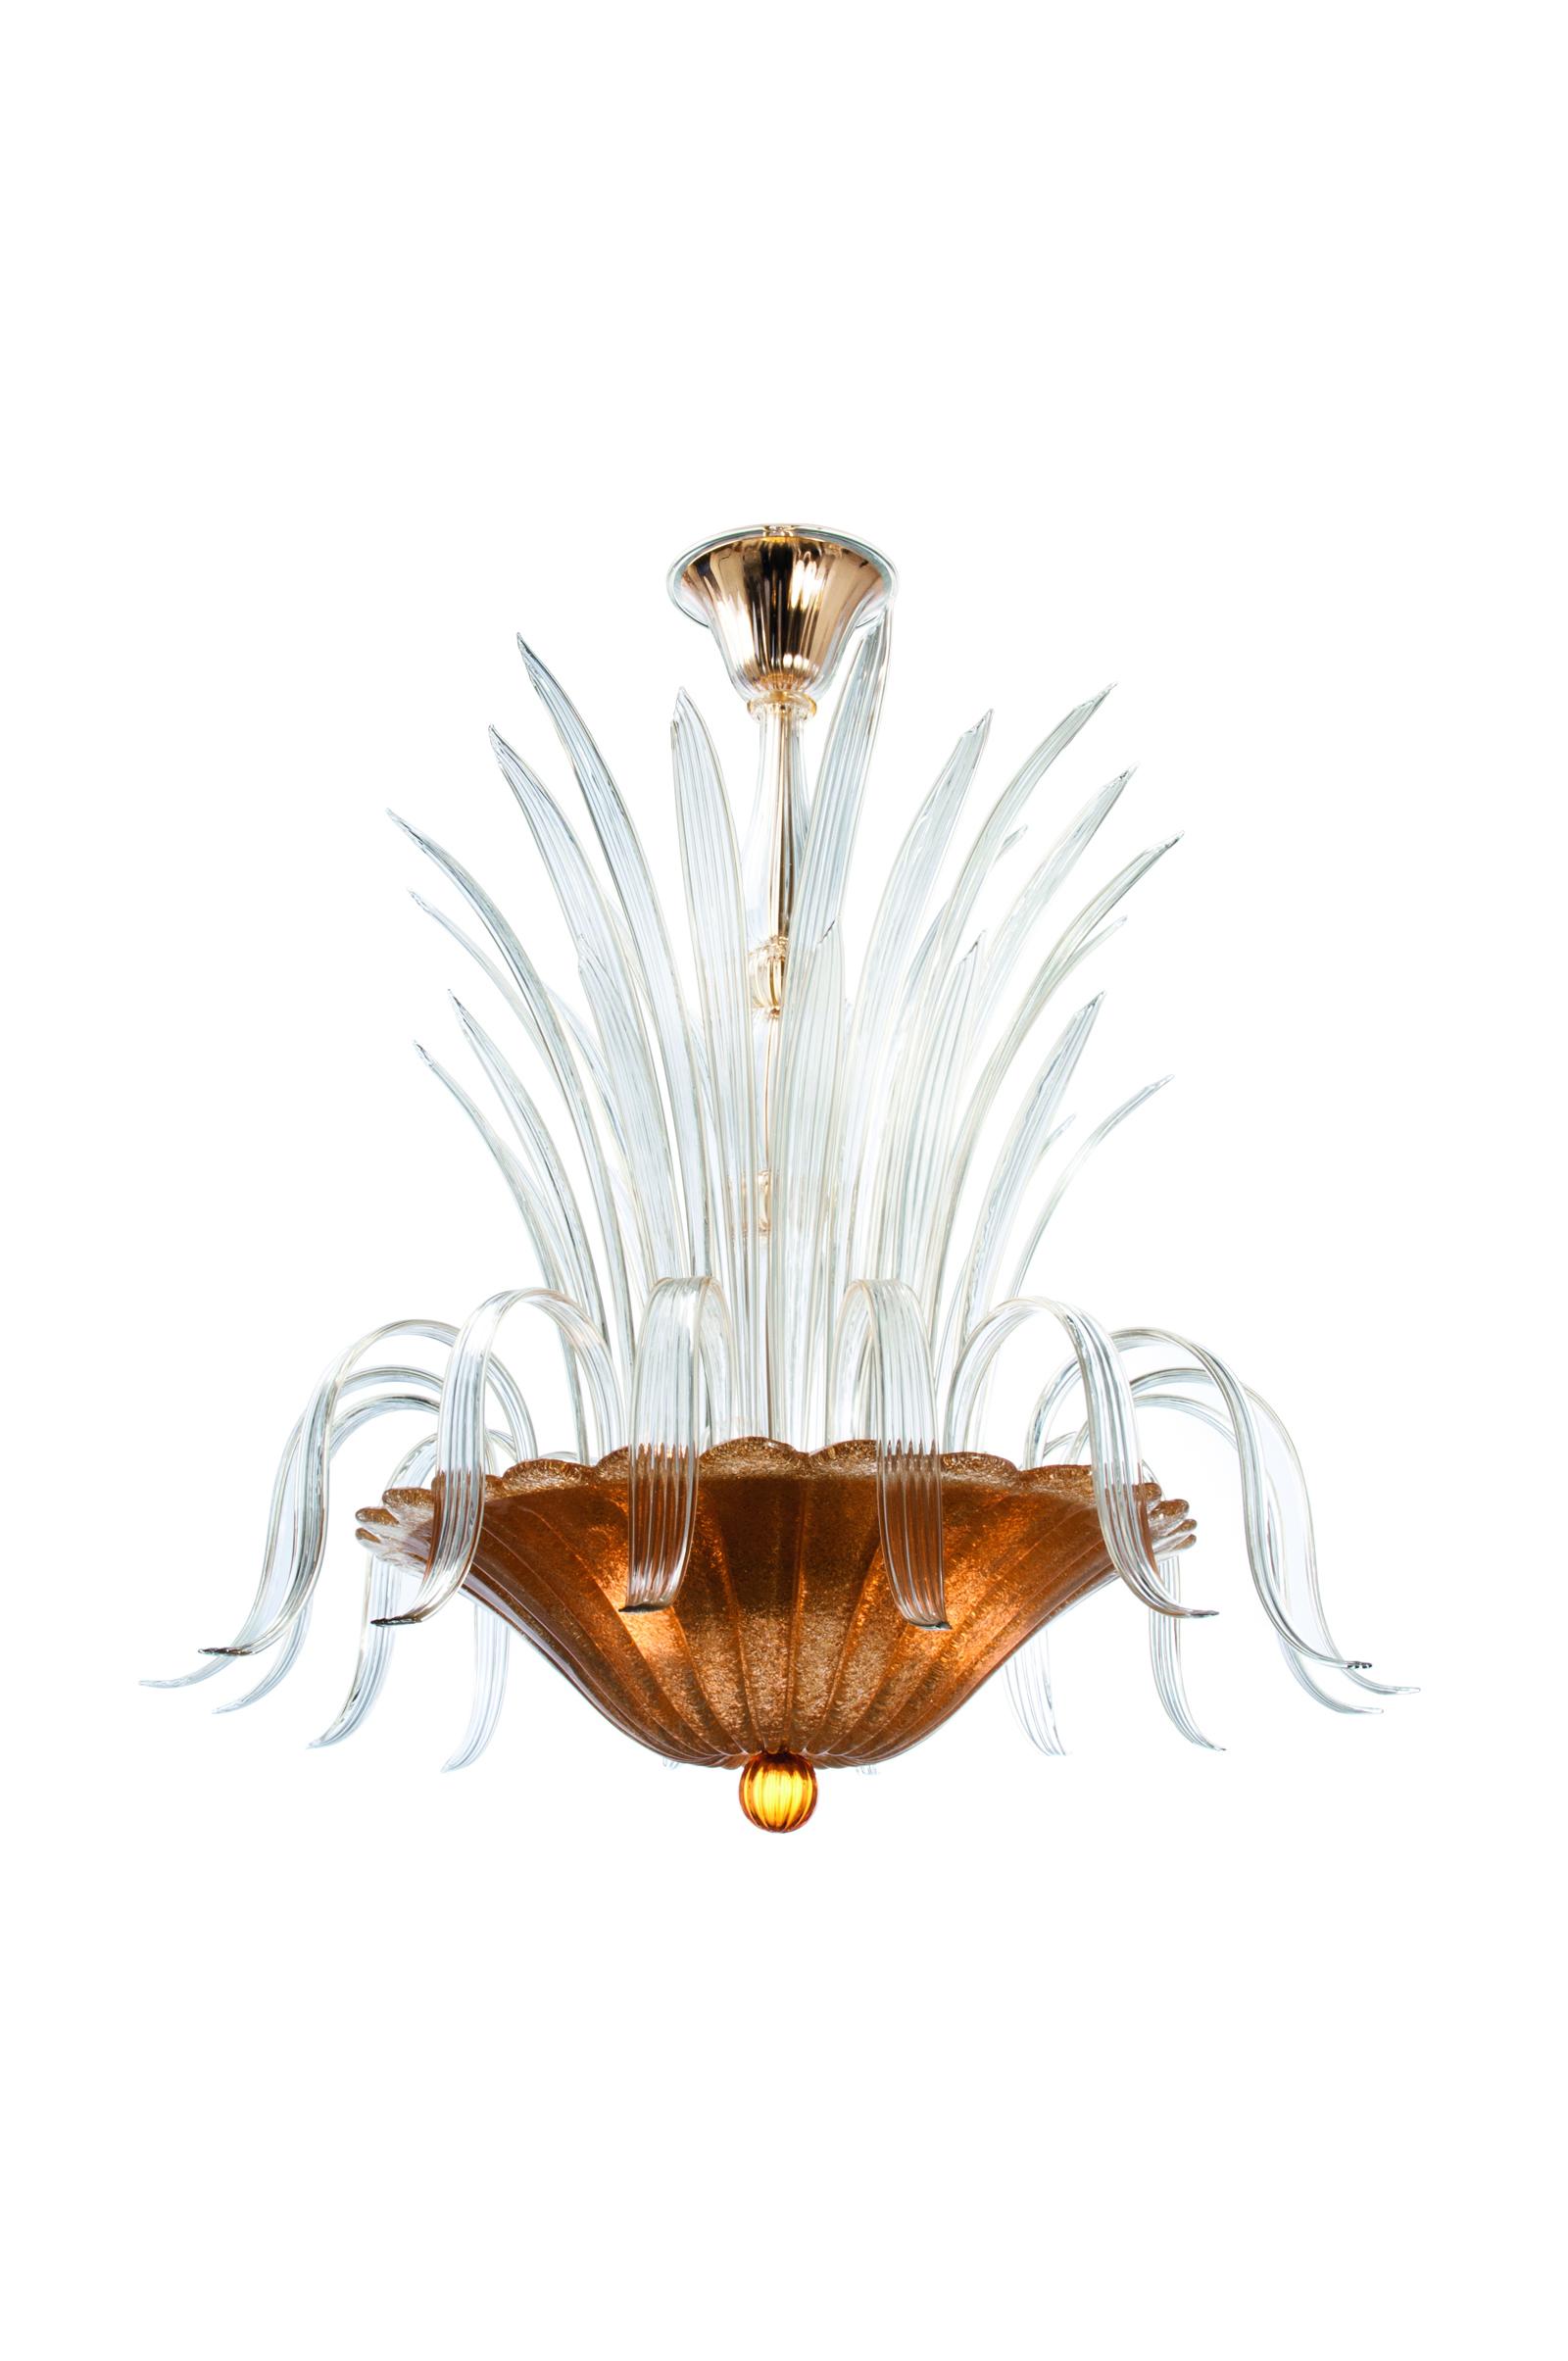 fontaine-lustre-chandelier-veronese-amber-ambre-11.jpg